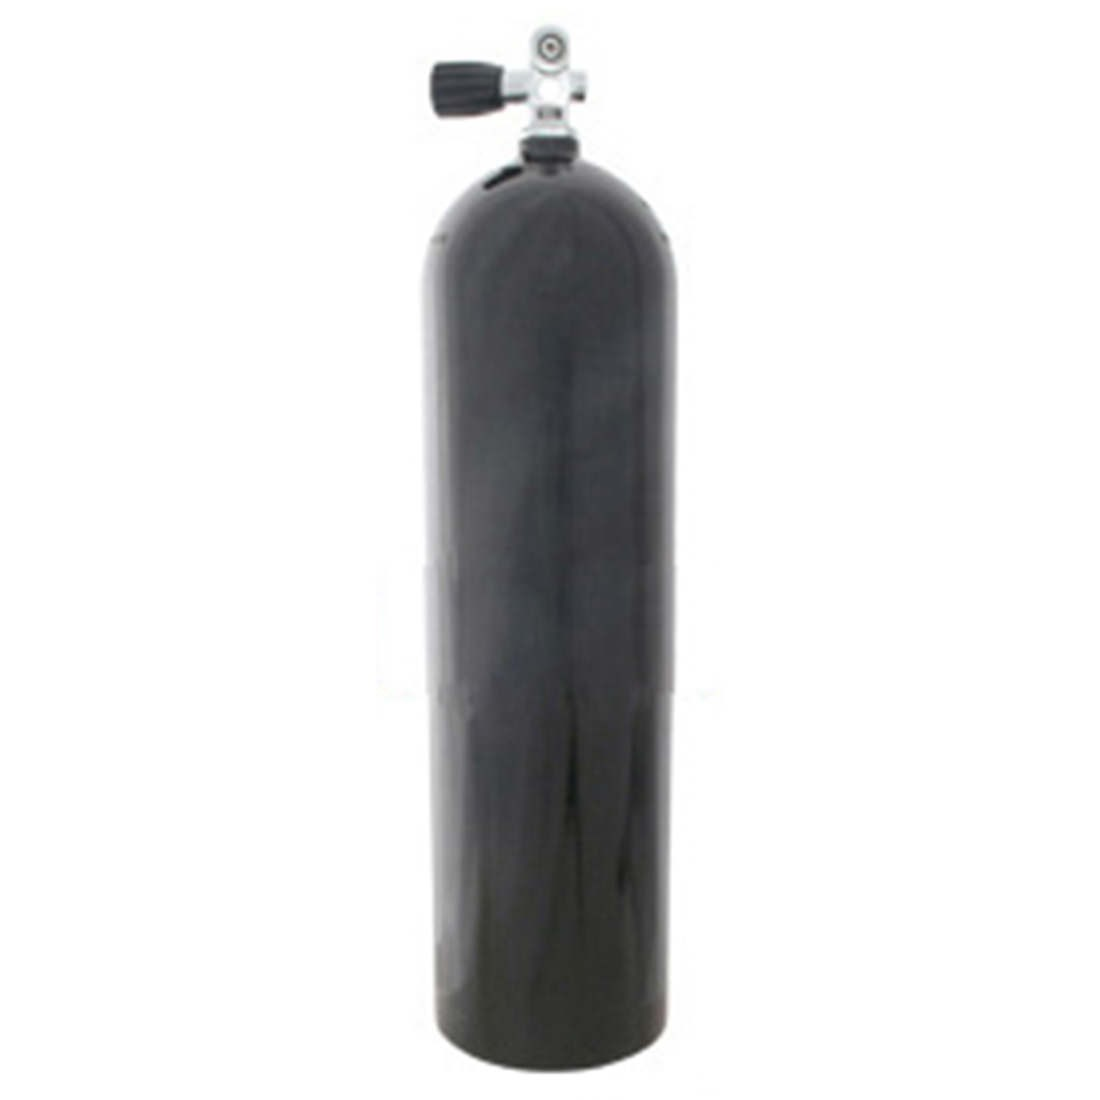 AL80 Aluminum SCUBA Cylinder with Pro Valve - Black AL80BK-PRO